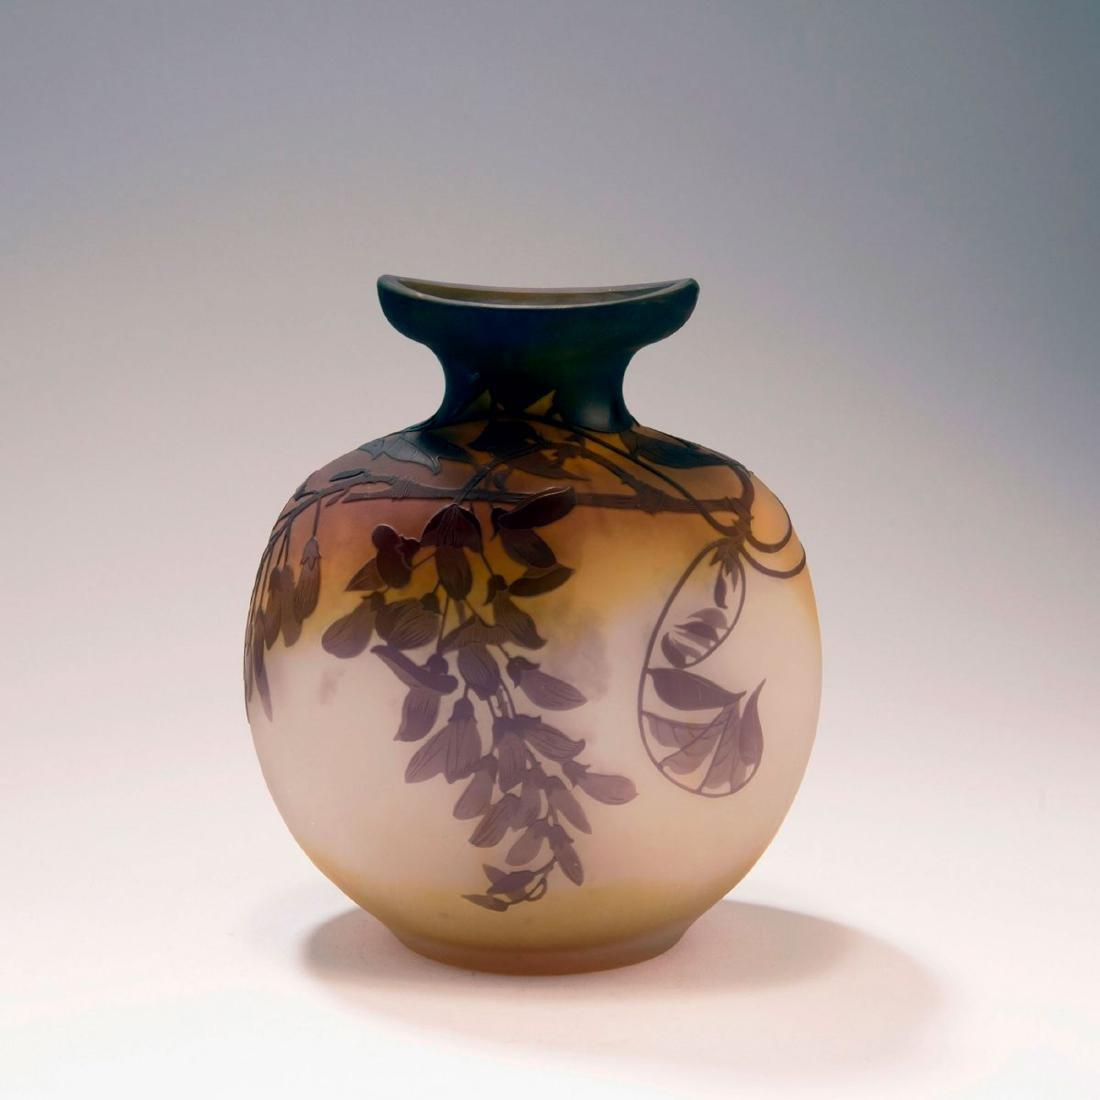 'Glycines' vase, 1905-06